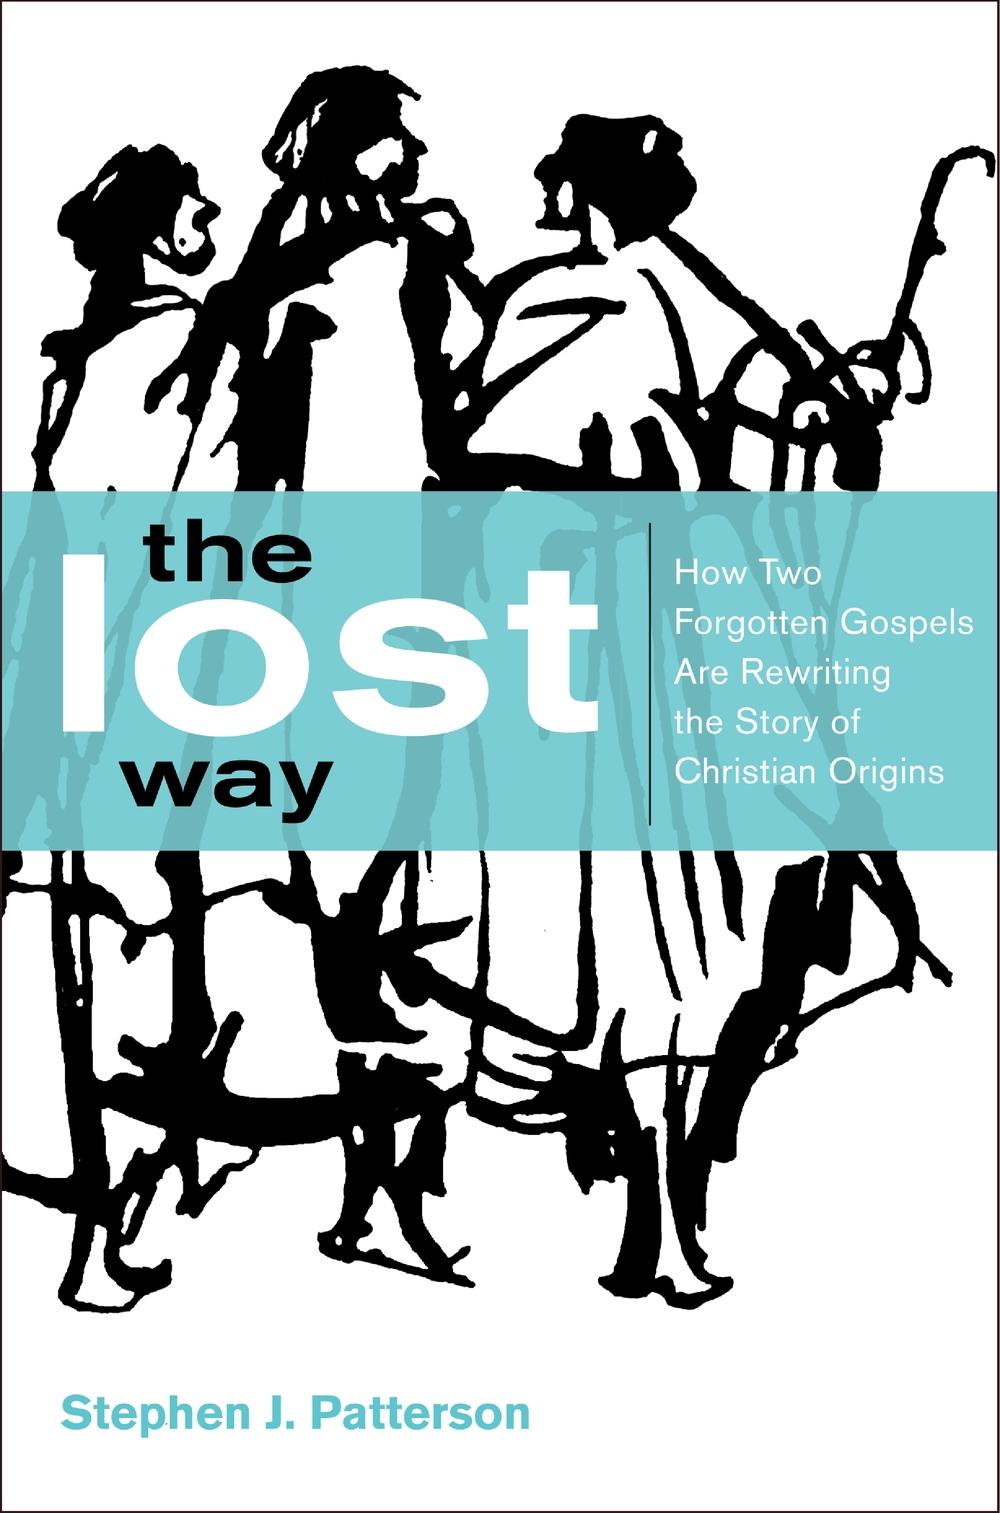 The Lost Way.JPG